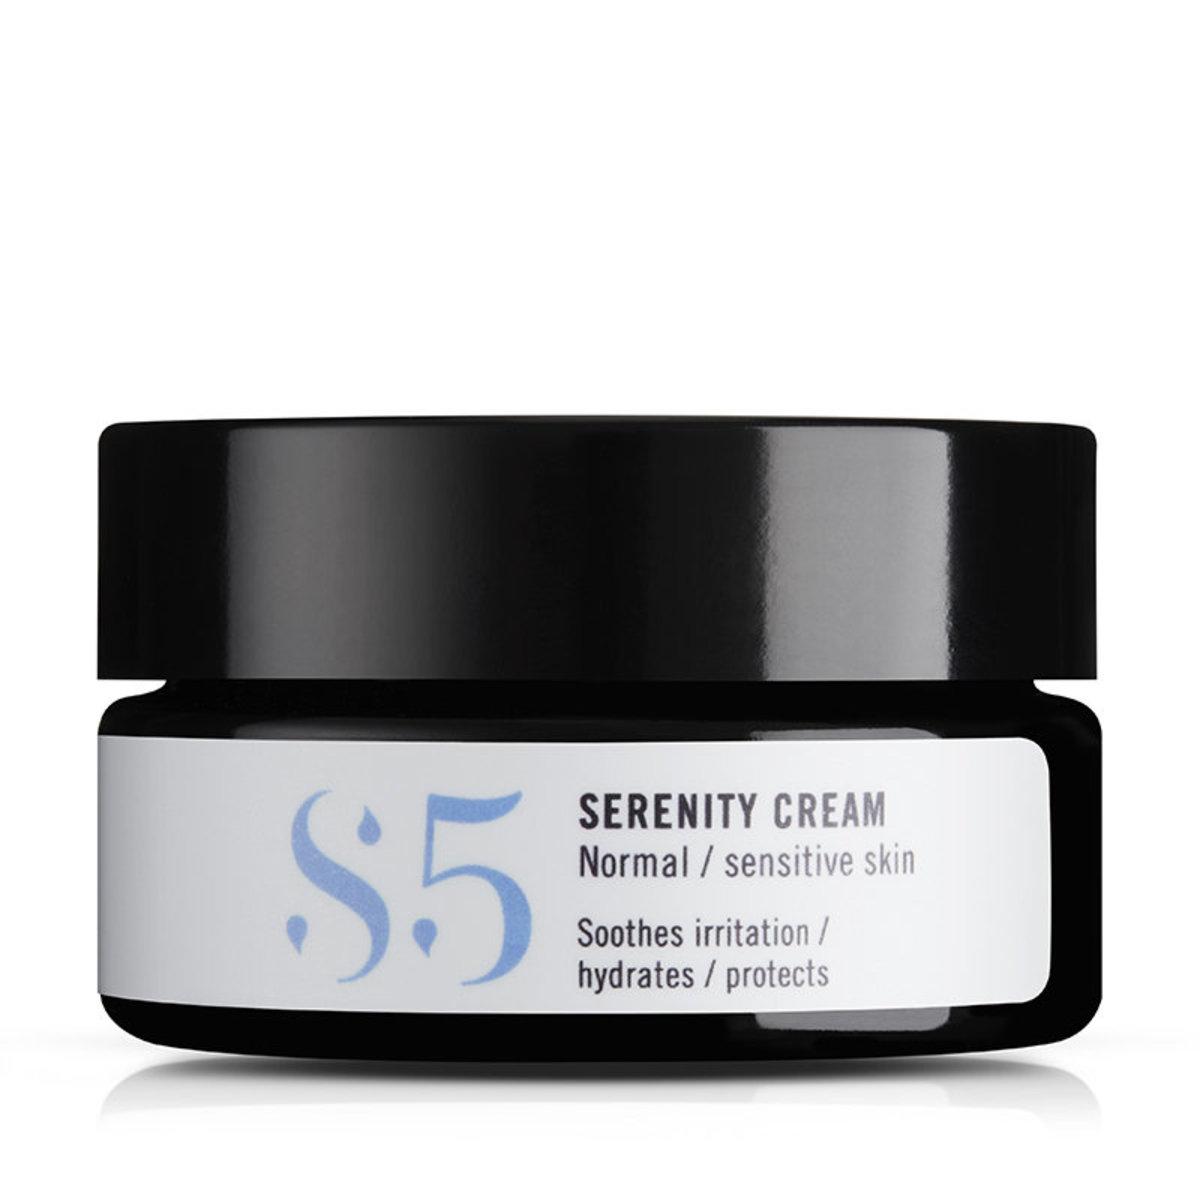 Serenity Cream (Travel size 15ml)